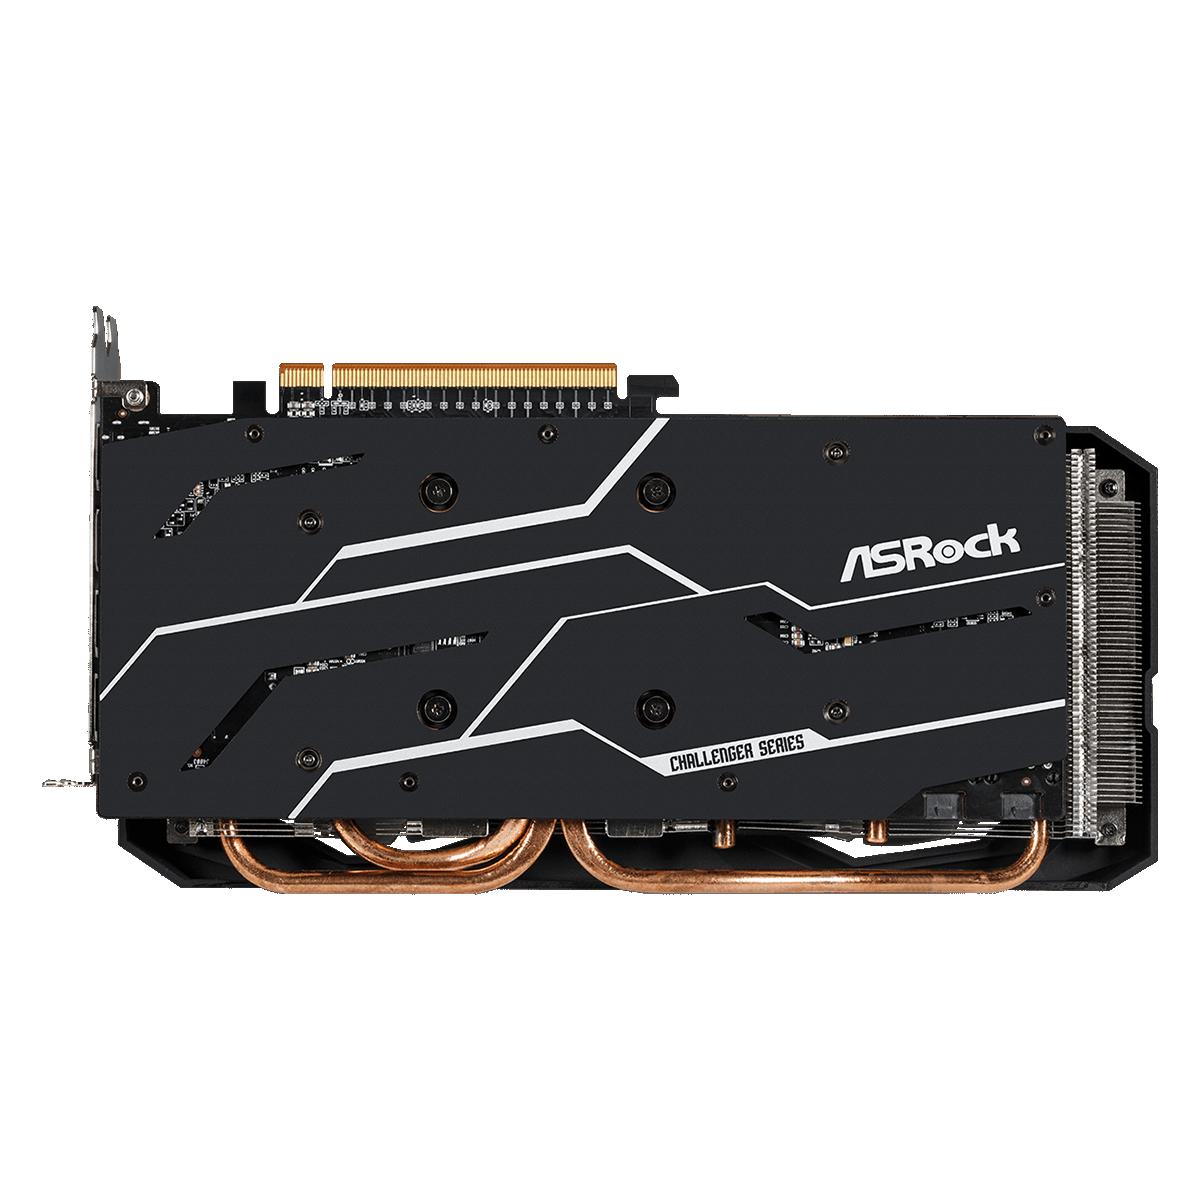 Placa de Vïdeo ASRock Radeon RX 6700 XT Challenger, 12GB, GDDR6, 192bit, 90-GA2KZZ-00UANF